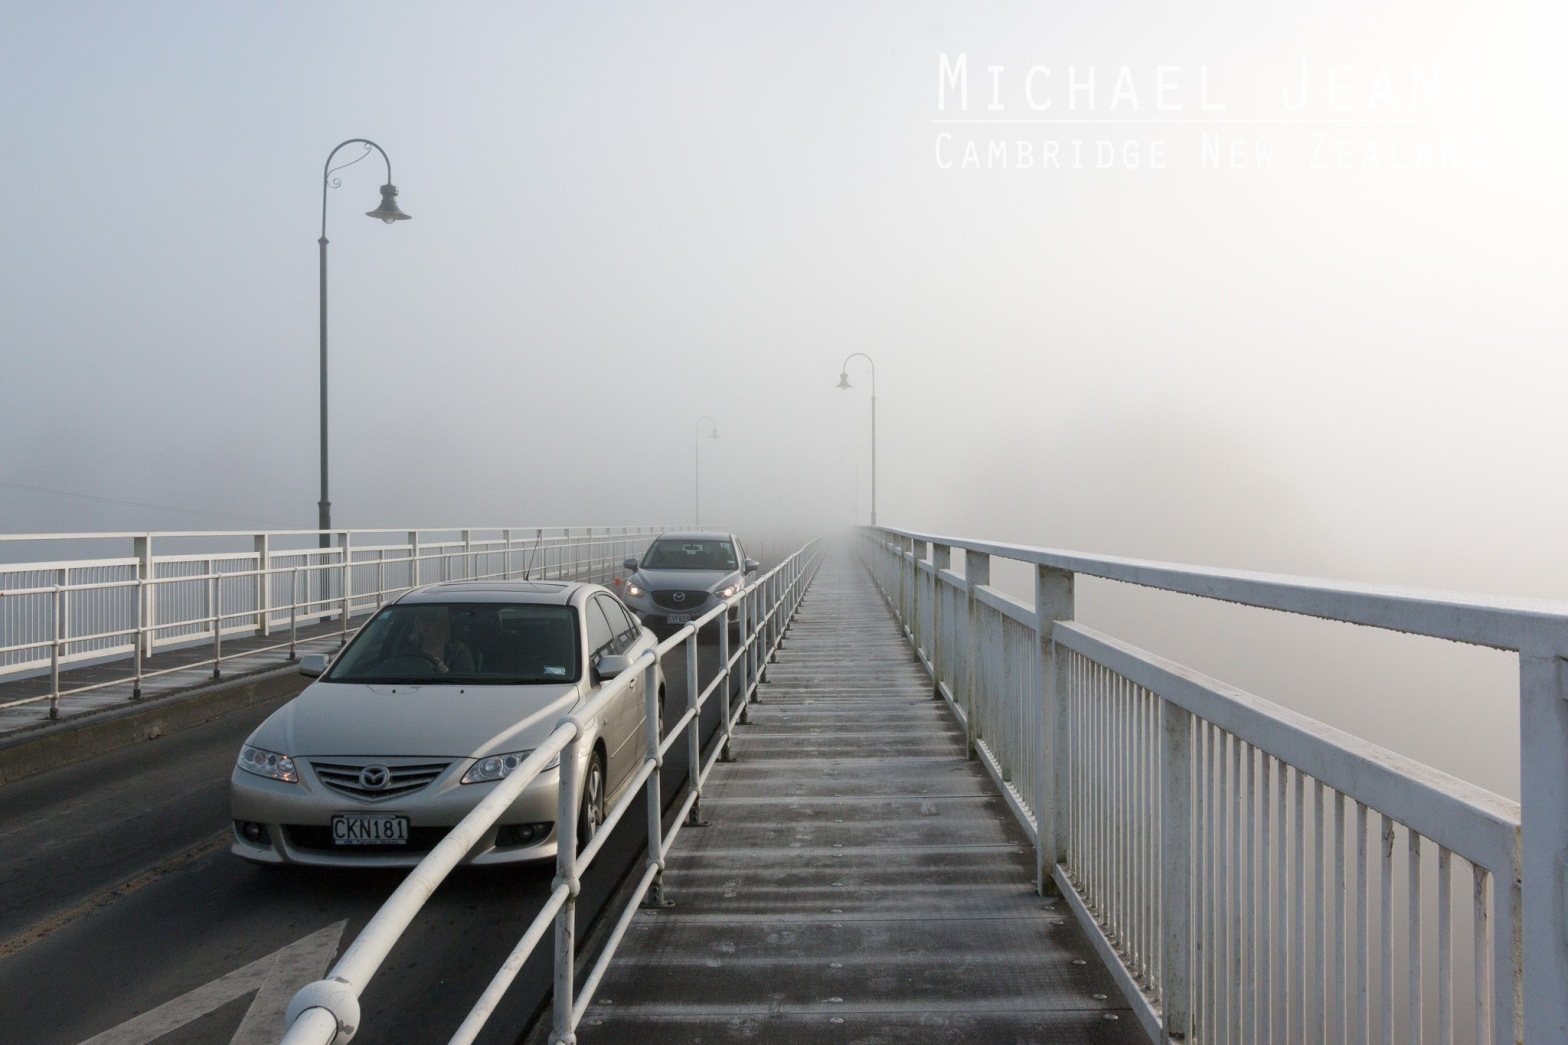 Victoria Bridge Waikato River Cambridge New Zealand